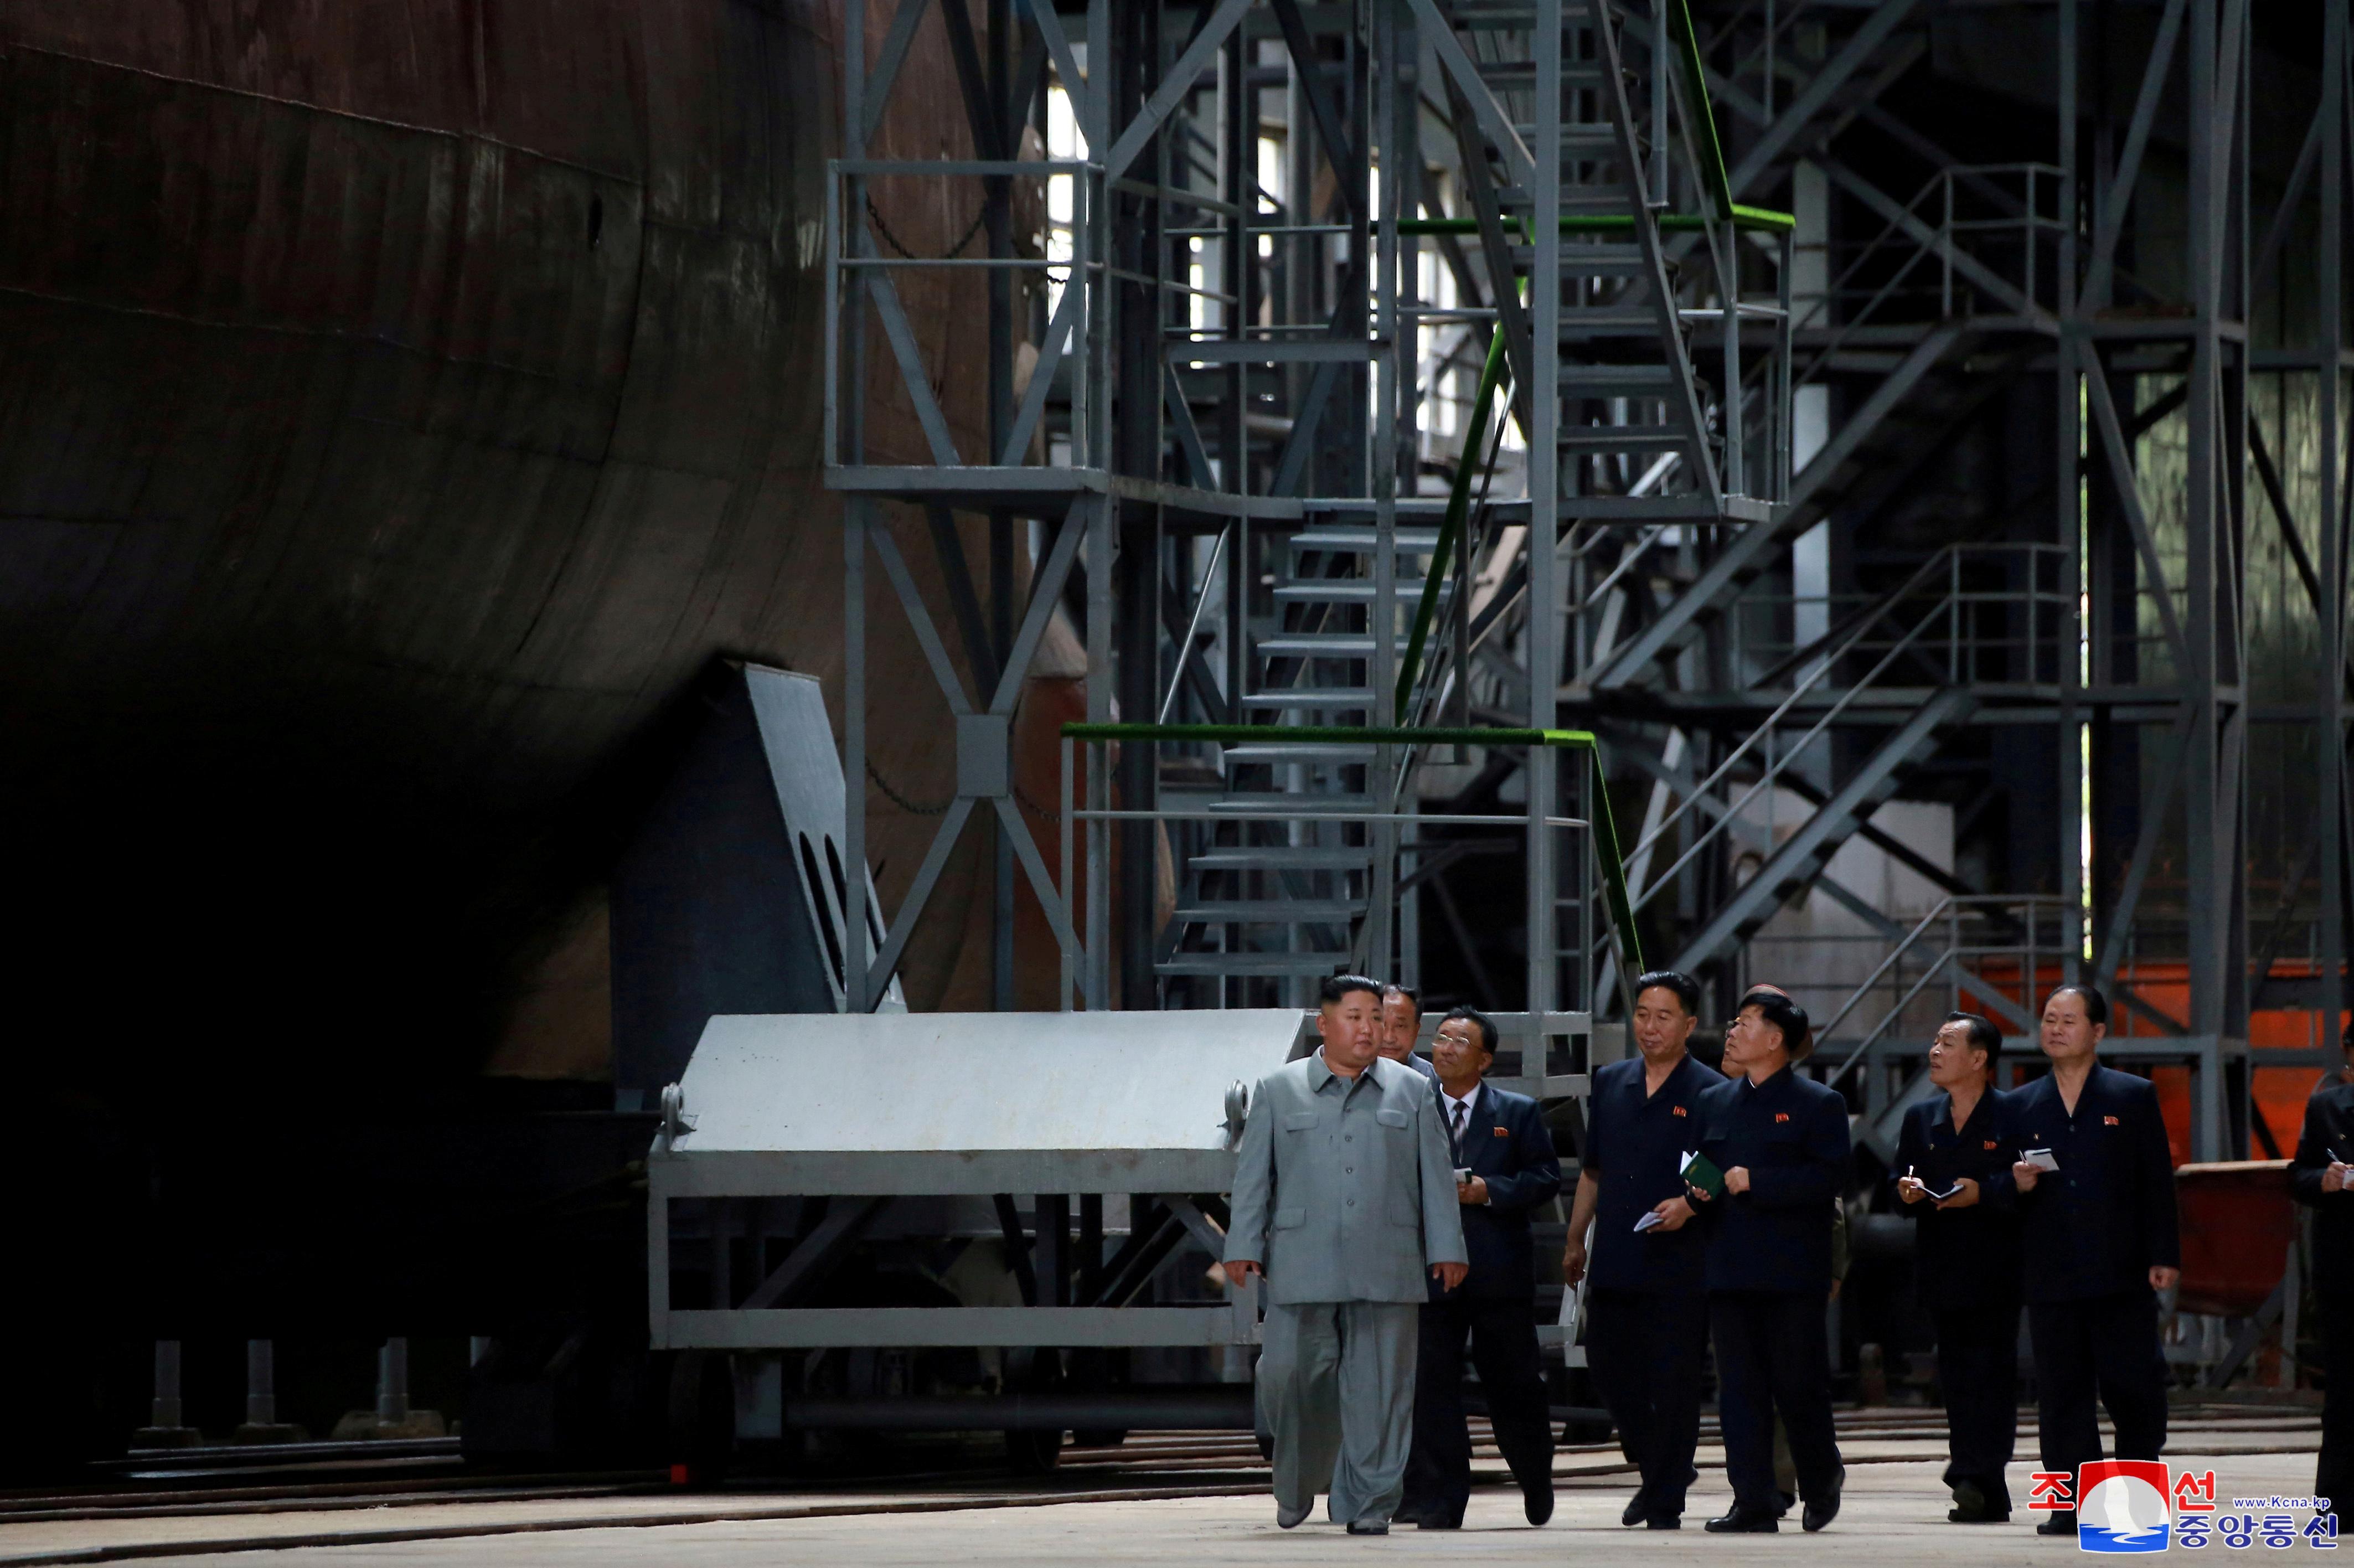 North Korea's Kim inspects new submarine, signals possible